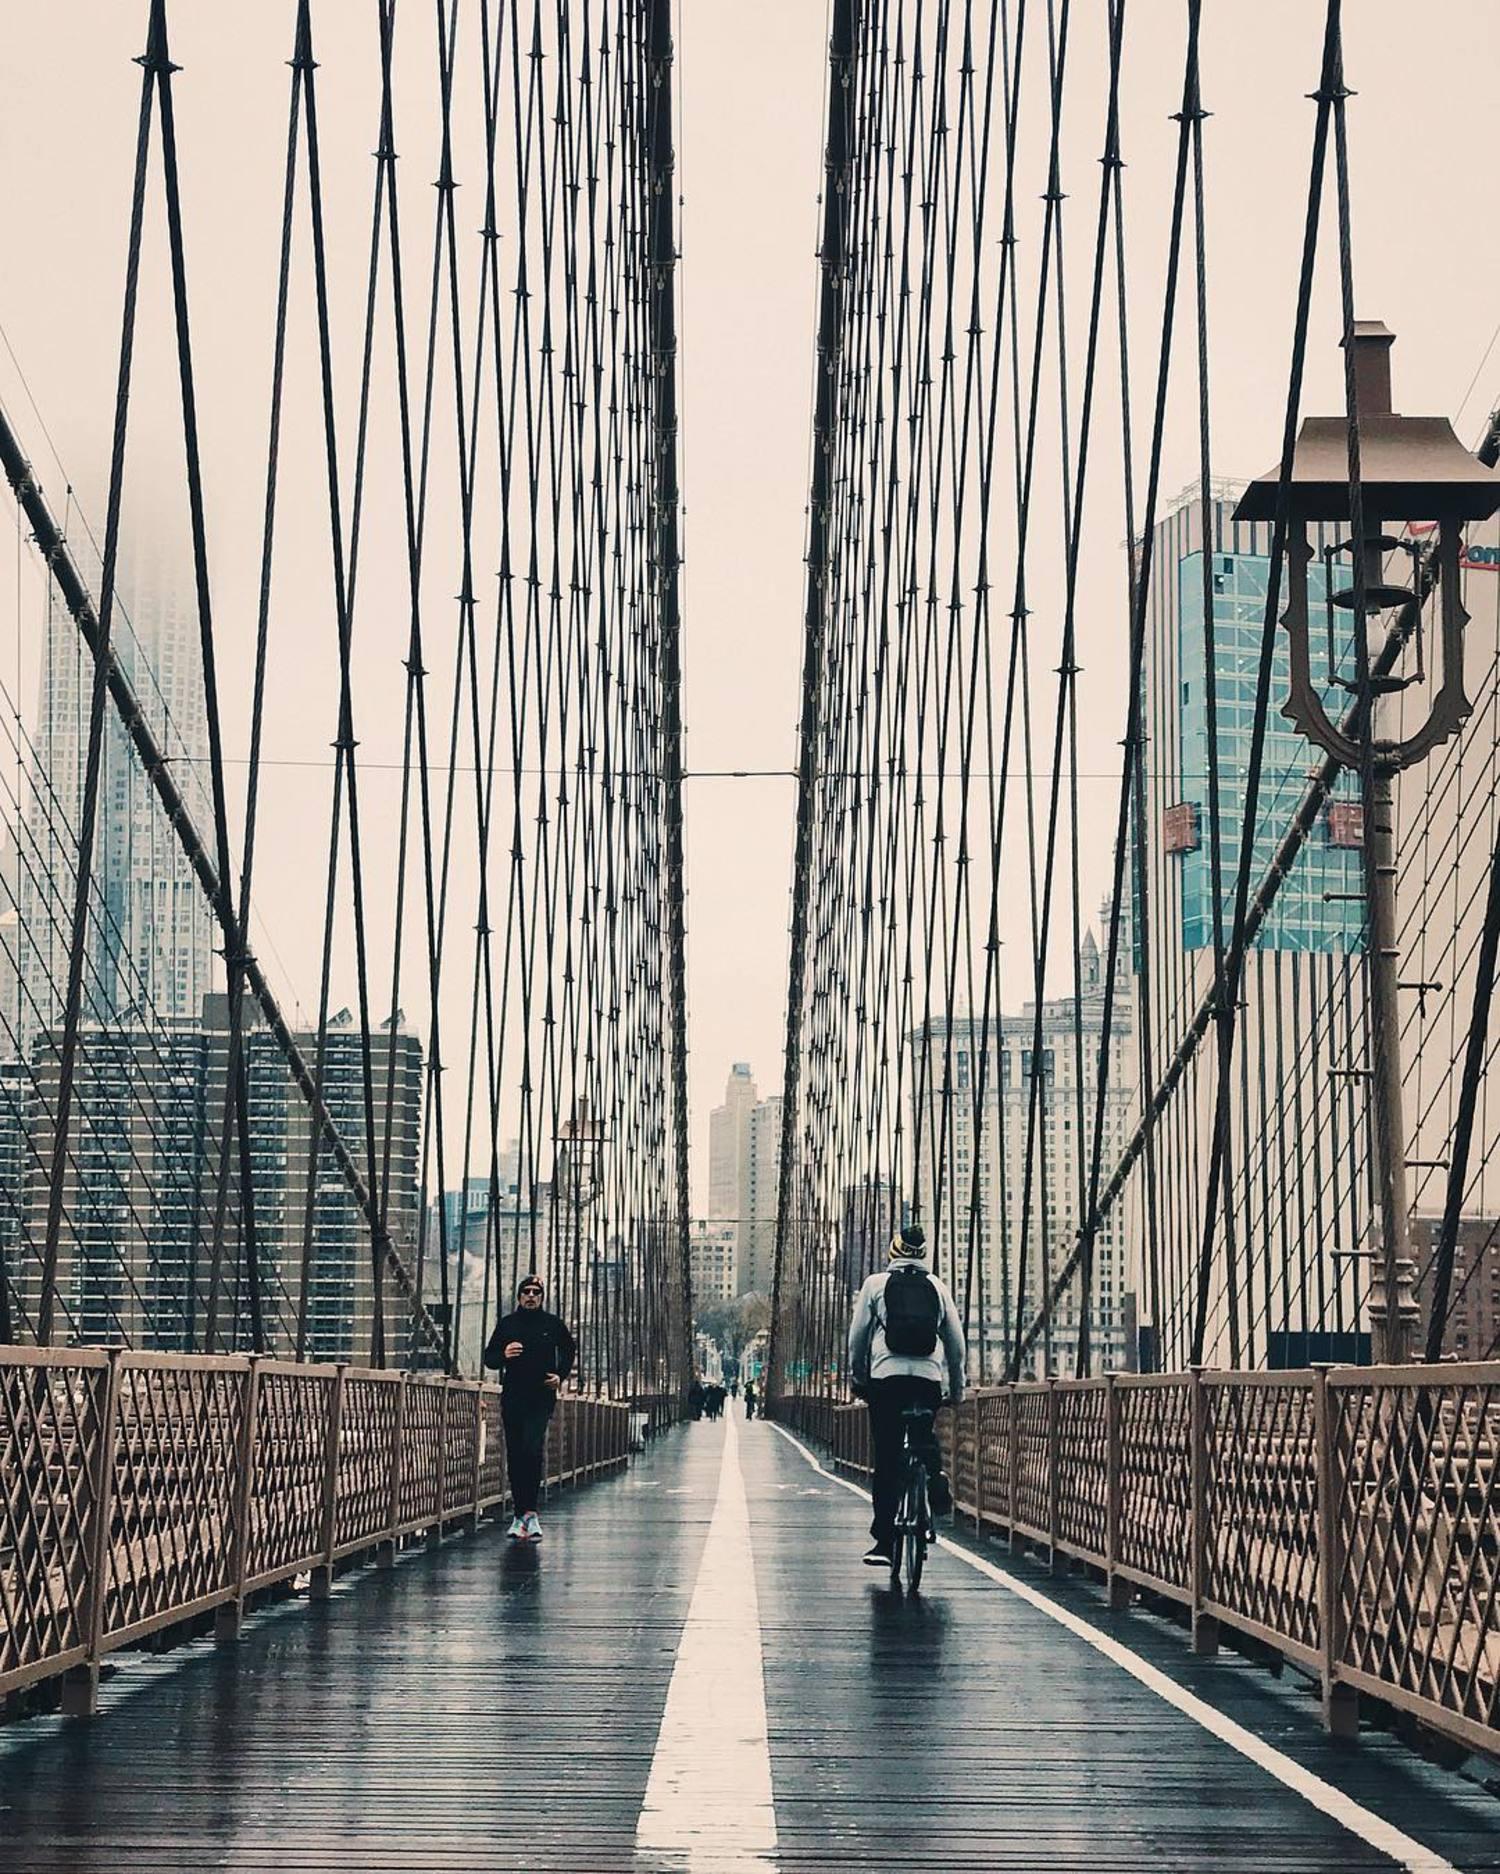 🏃🏻🚴🏼🌧☔️ . . . #vsco #vscocam #nbc4ny #abc7ny #NYC #NewYork #NewYorkCity #huffpostgram #morningslikethese #autumn #vscogood #made_in_ny #neverstopexploring #explore #exploreeverything #communityfirst #thatsdarling #seeyourcity #symmetry #thisisnewyorkcity #symmetricalmonsters #symmetrykillers #nature #nypix